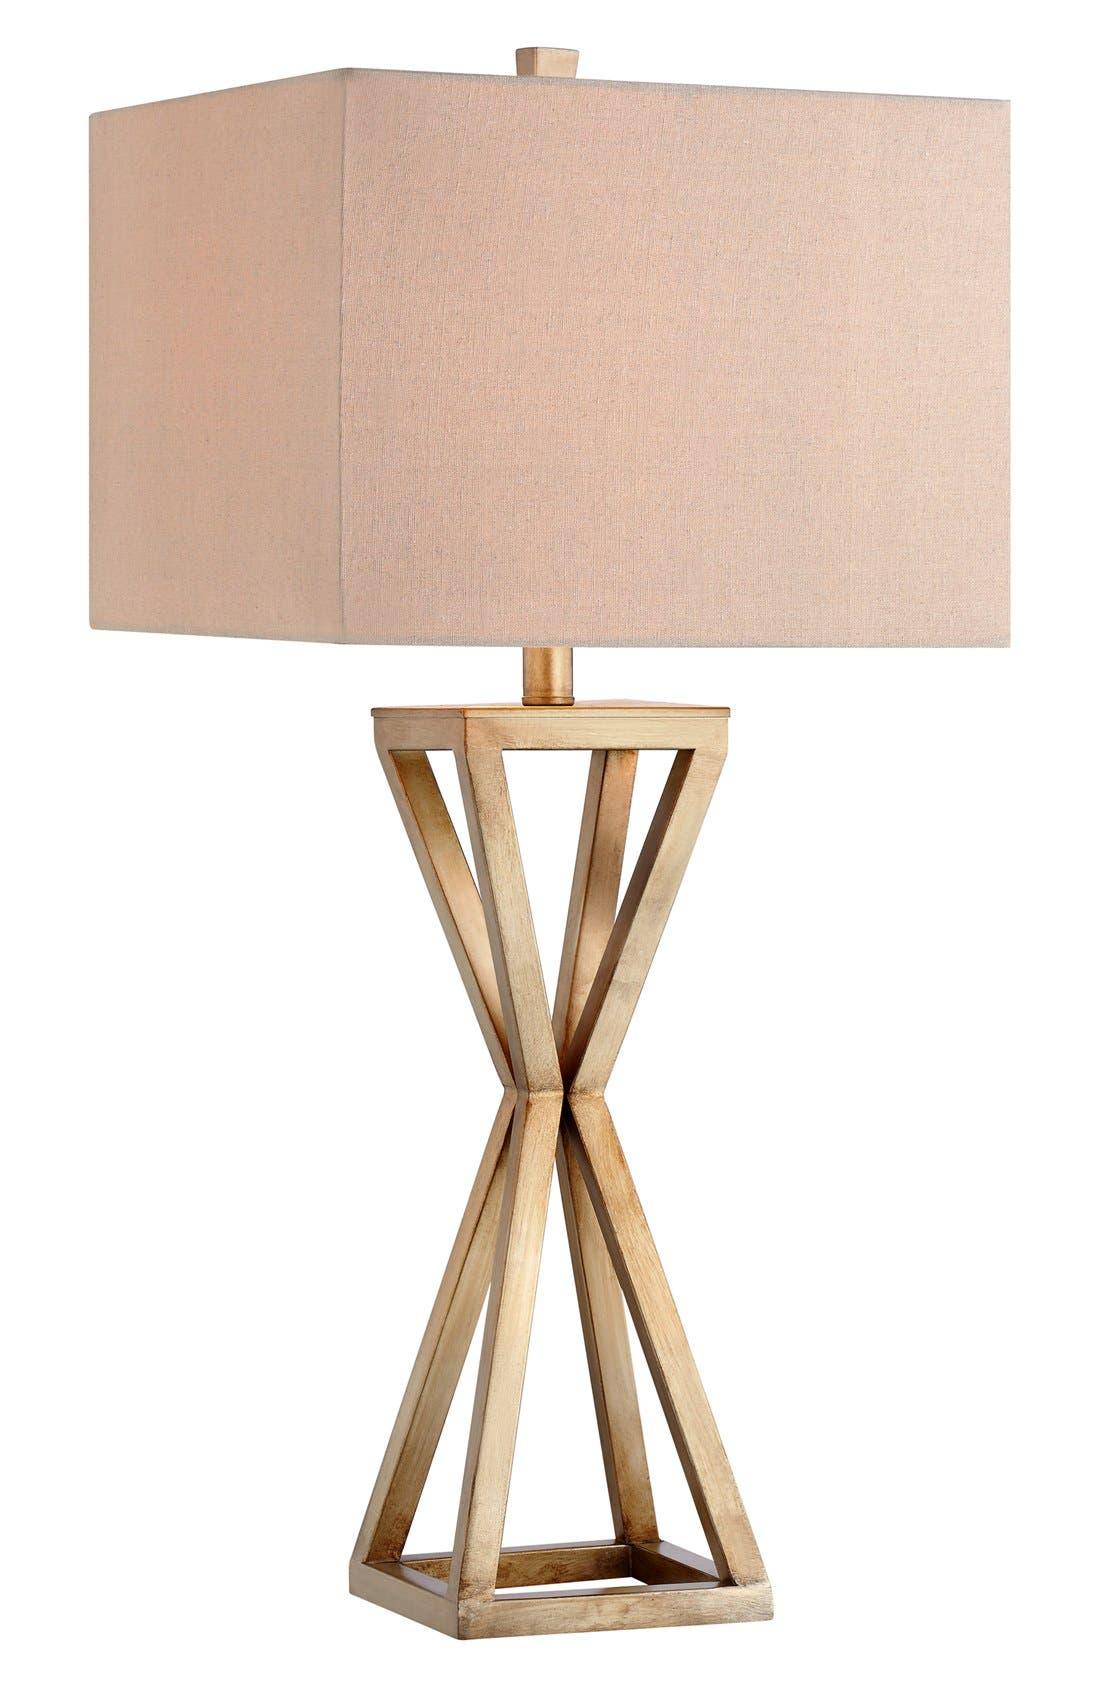 JAlexander Lighting Open Caged Metal Table Lamp